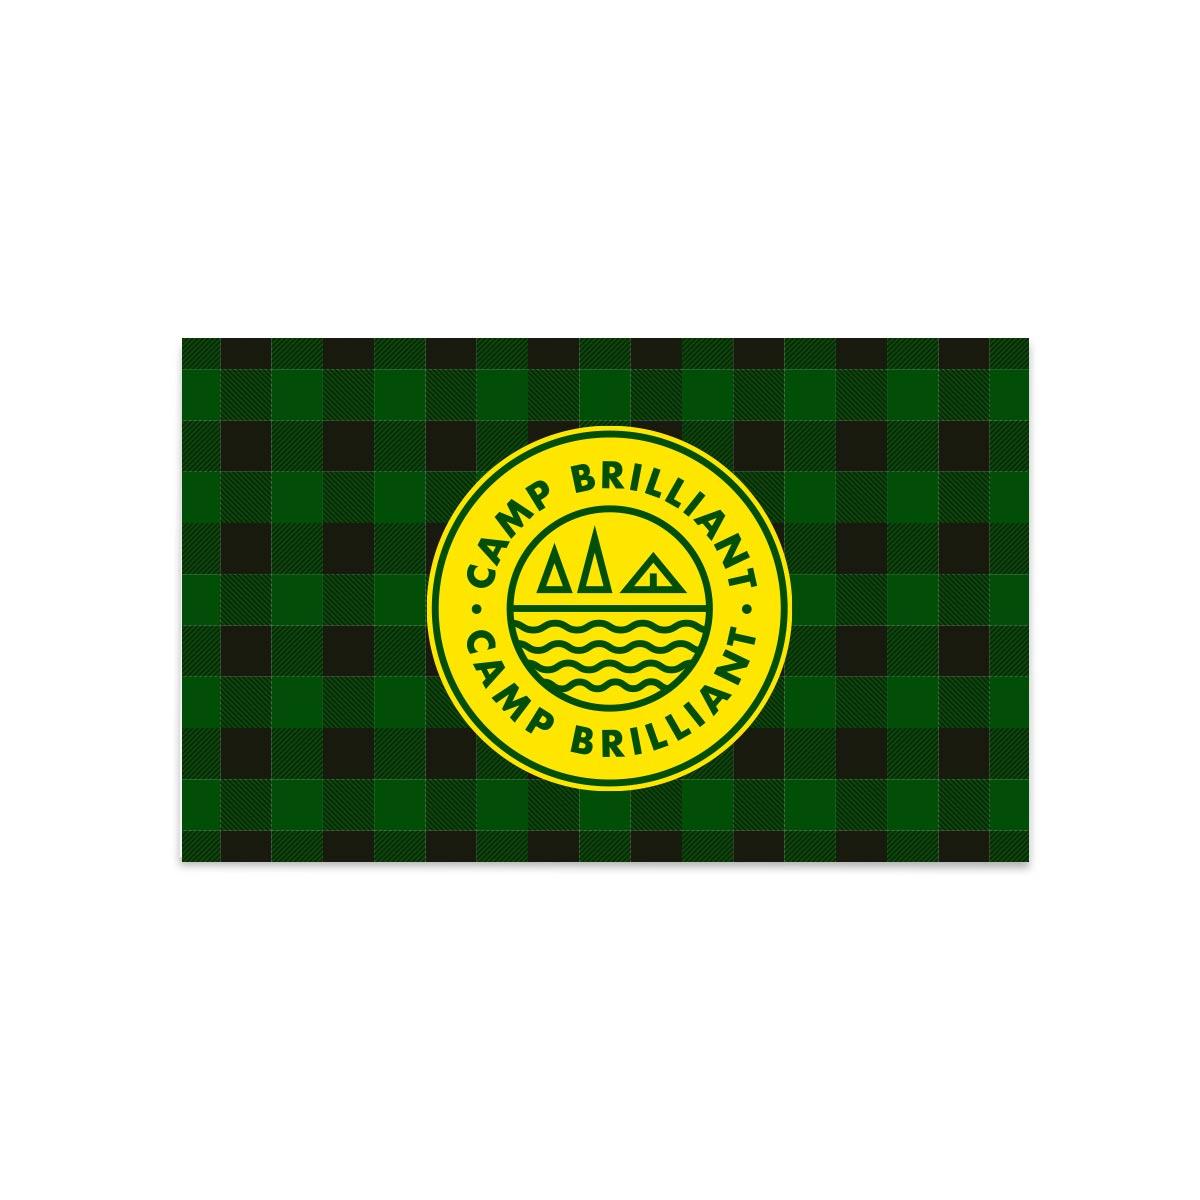 229177 3 x 5 flag full color digital imprint